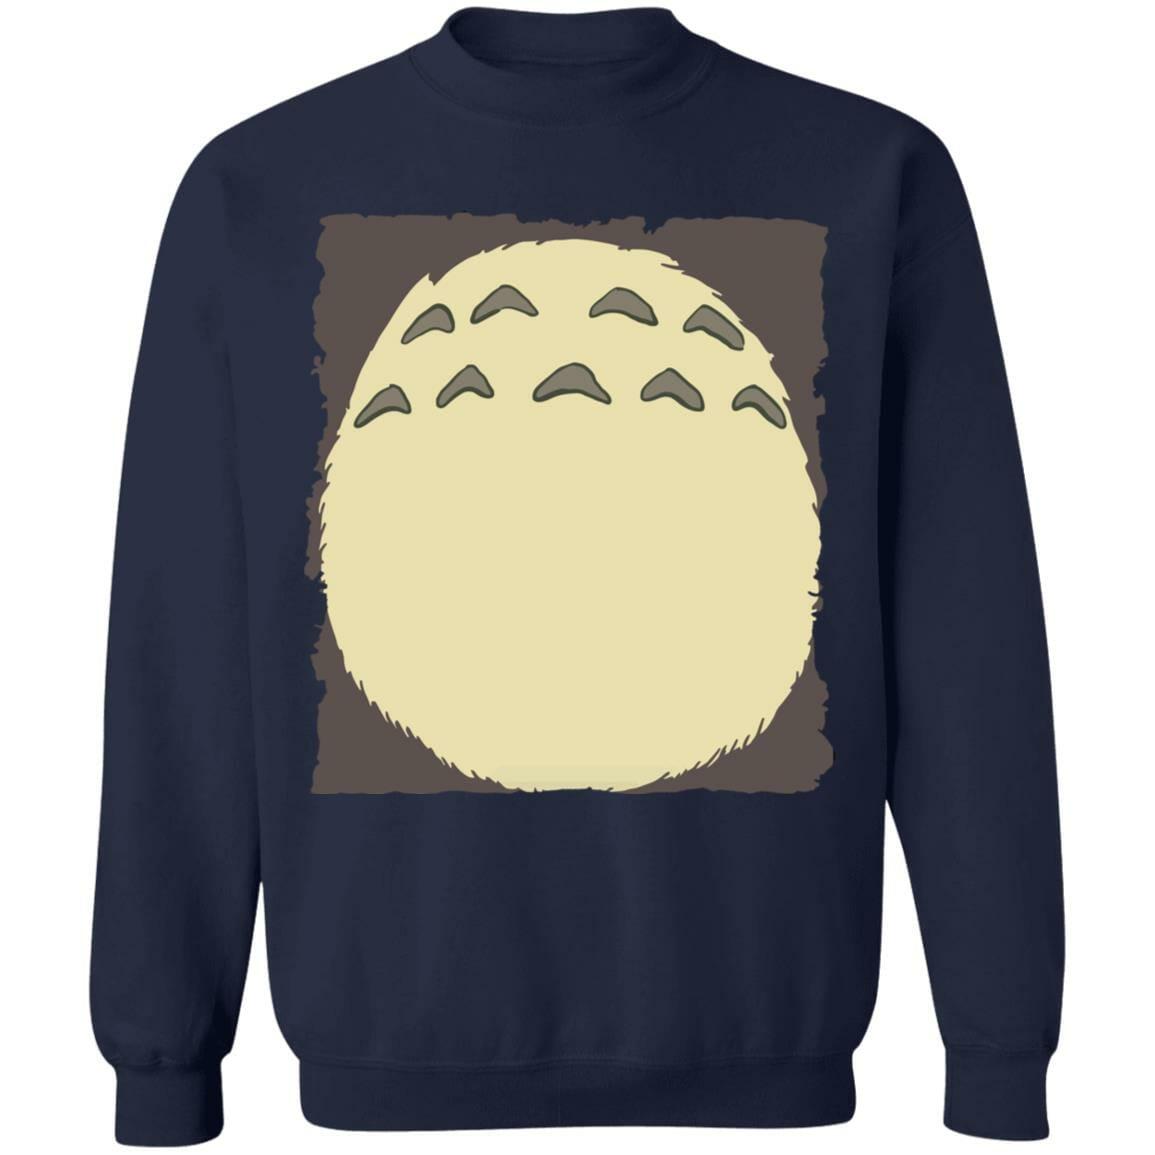 My Neighbor Totoro – Totoro Belly Sweatshirt